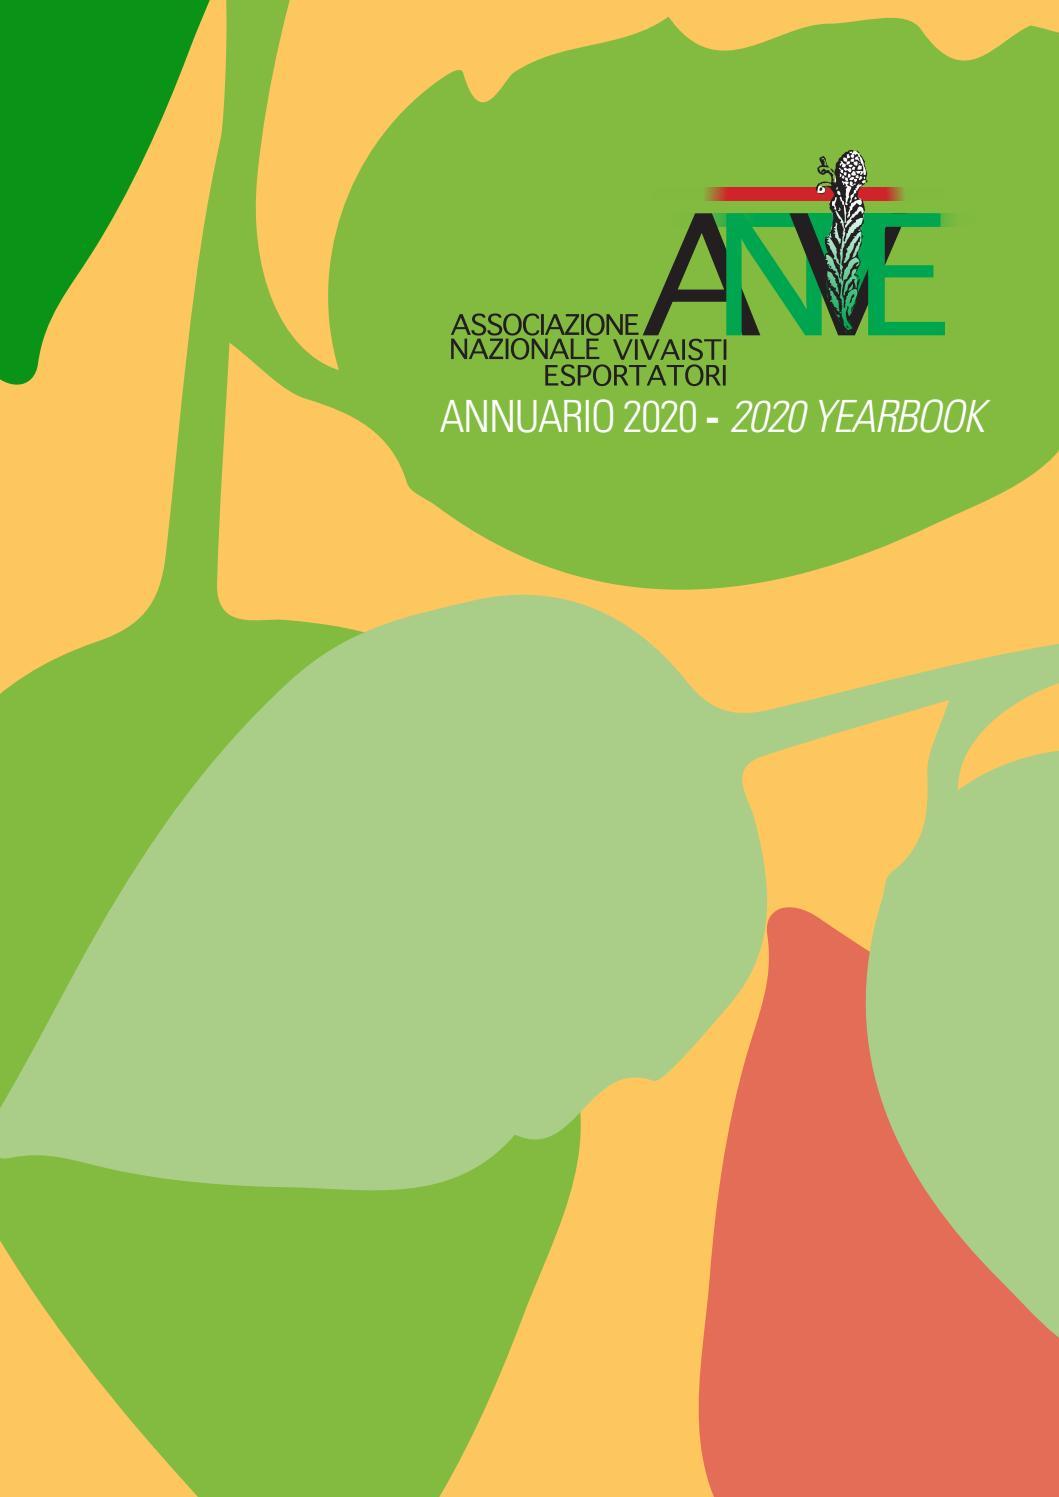 Acero Radici Invasive annuario anve 2020 - yearbook anve 2020 by anve